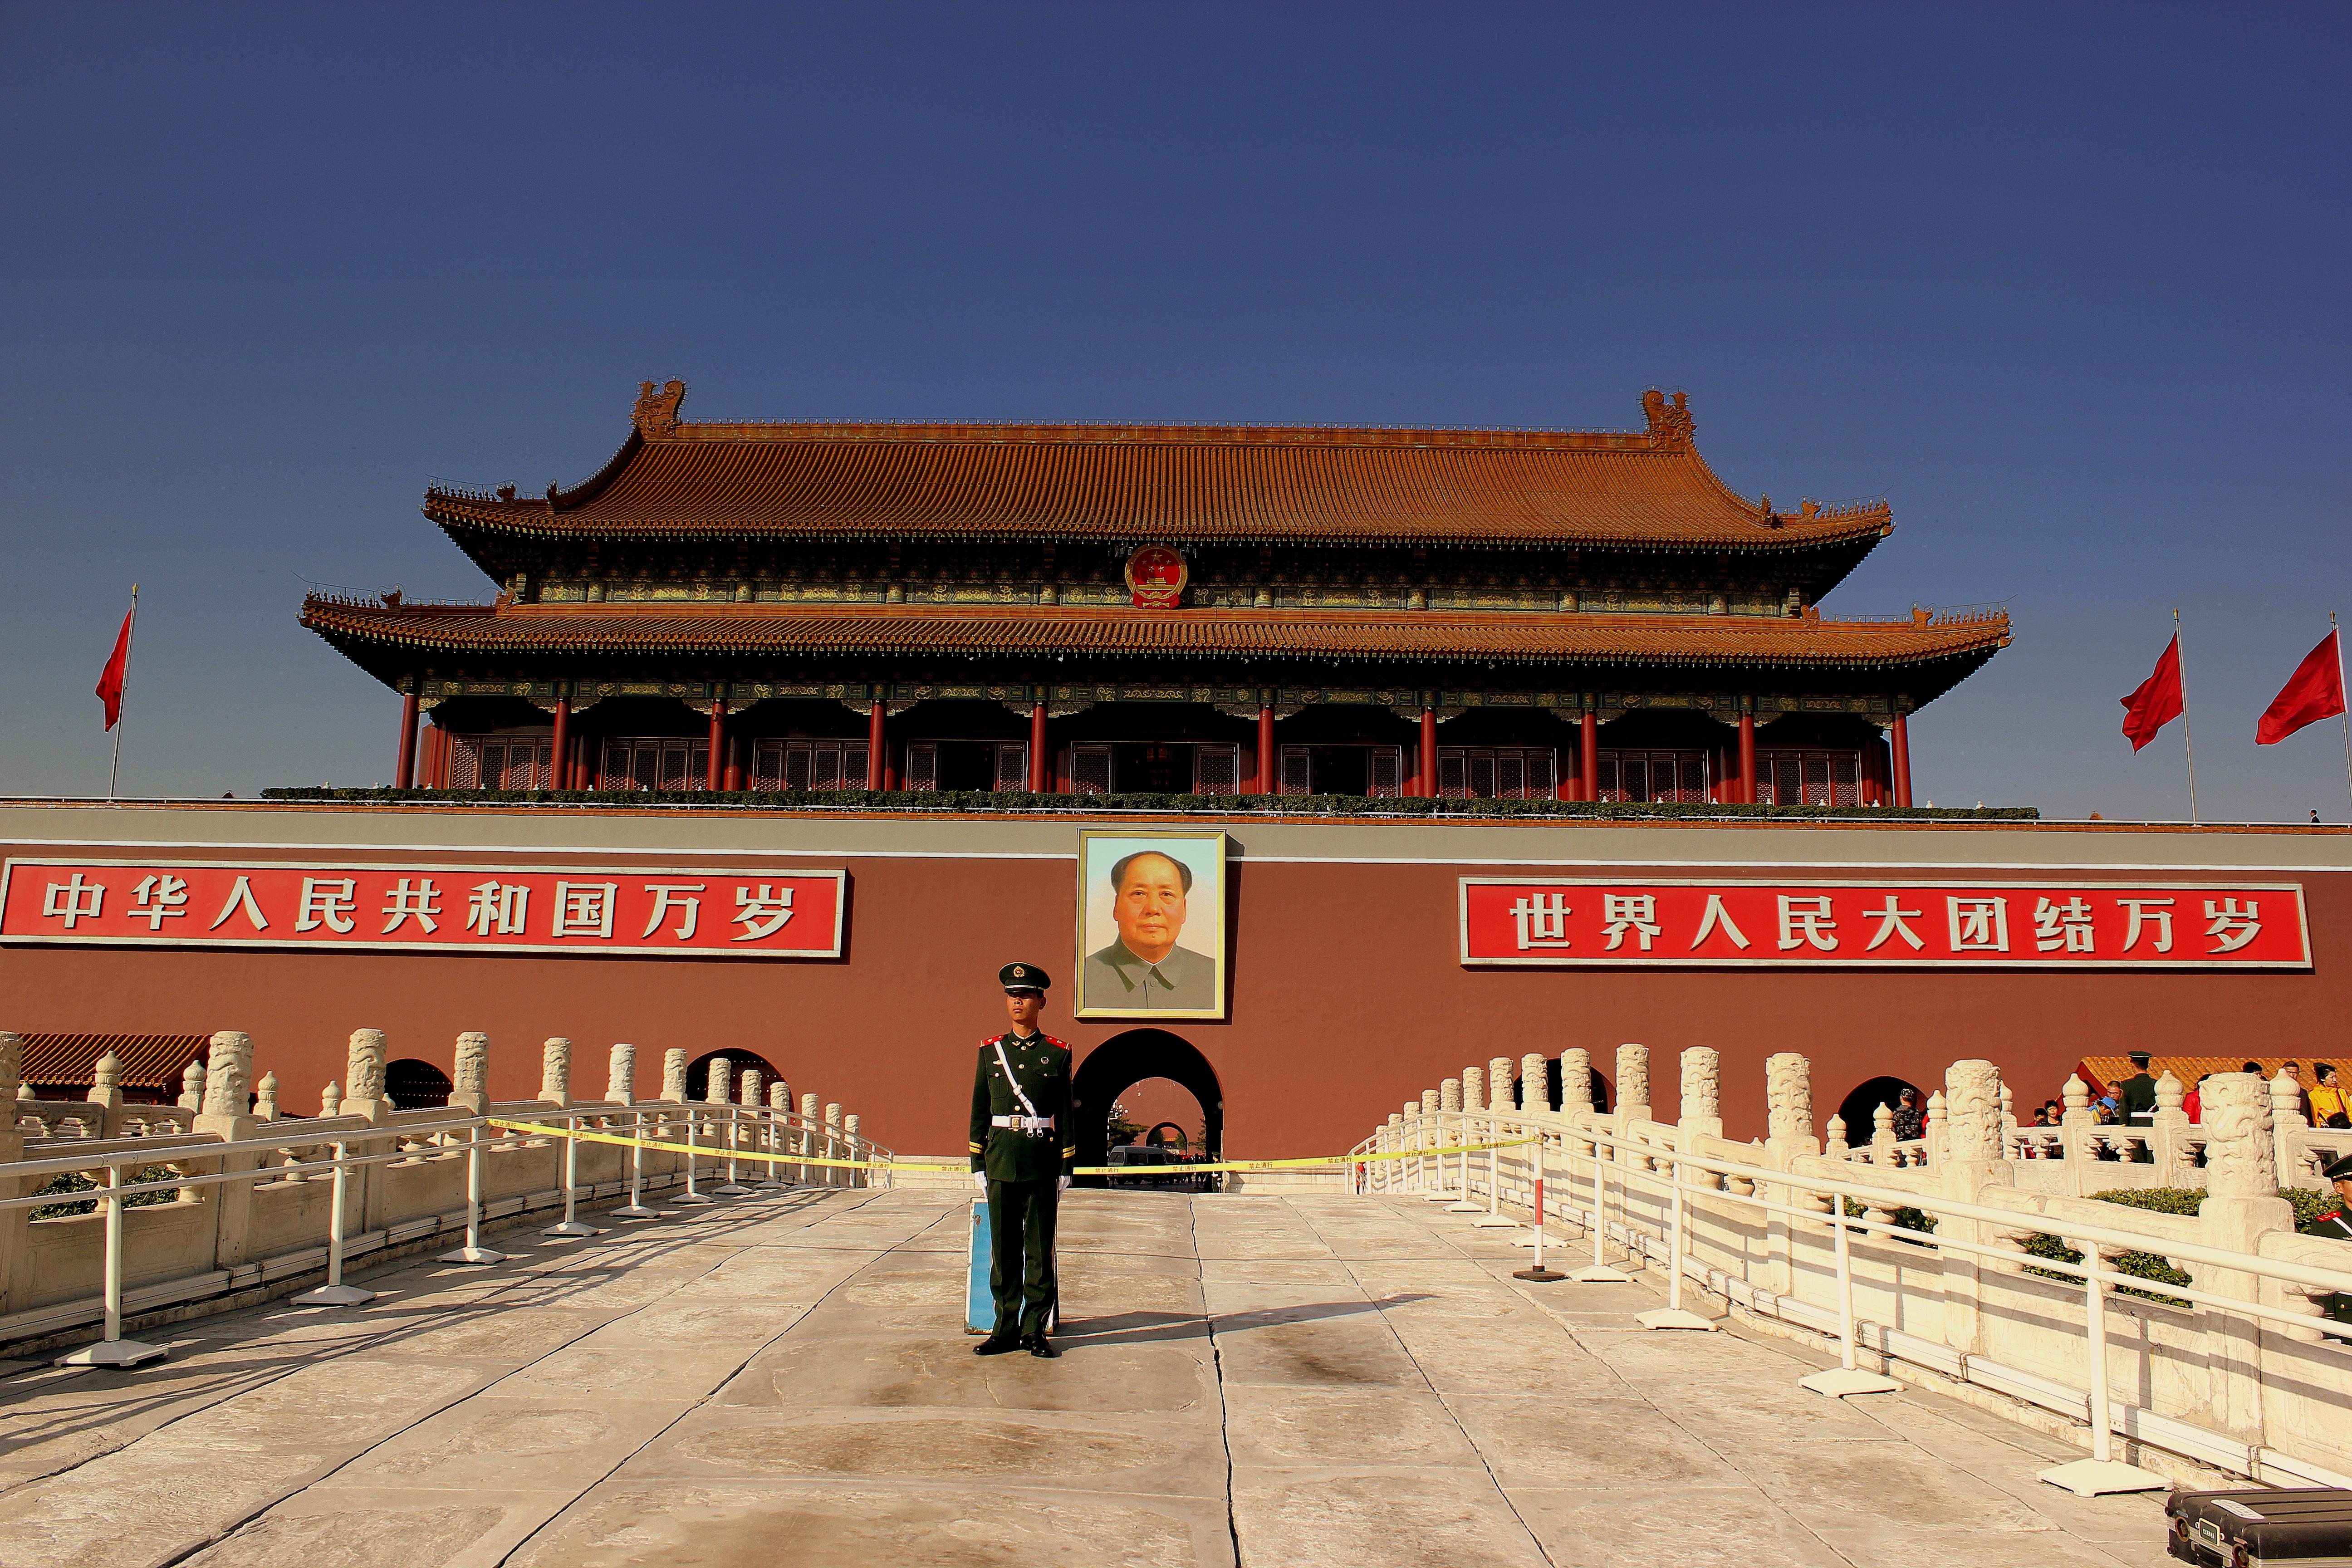 FileENTRANCE TO THE FORBIDDEN CITY BEIJING CHINA NOV 2012 8176099624